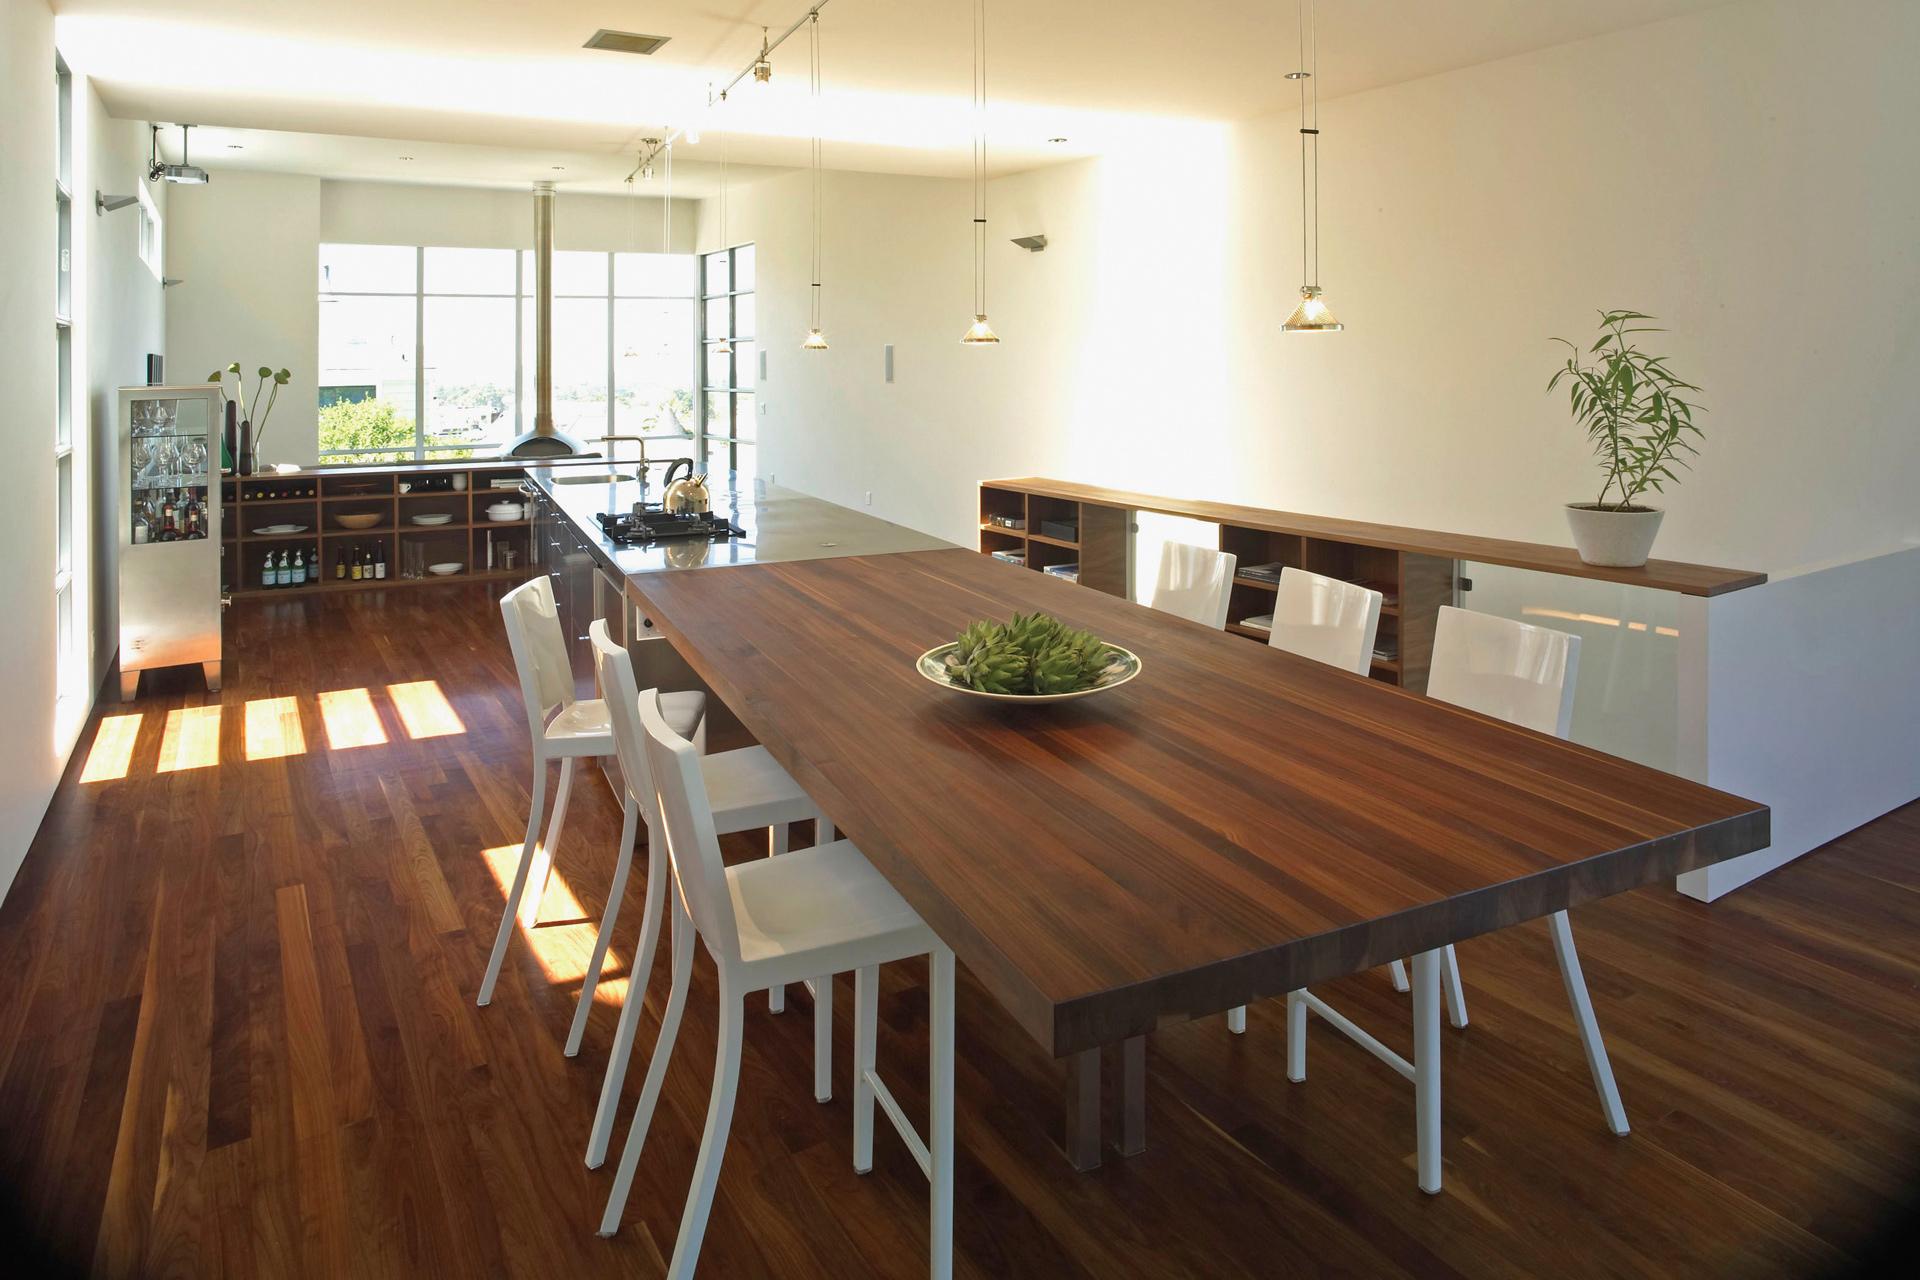 Haus Martin home design